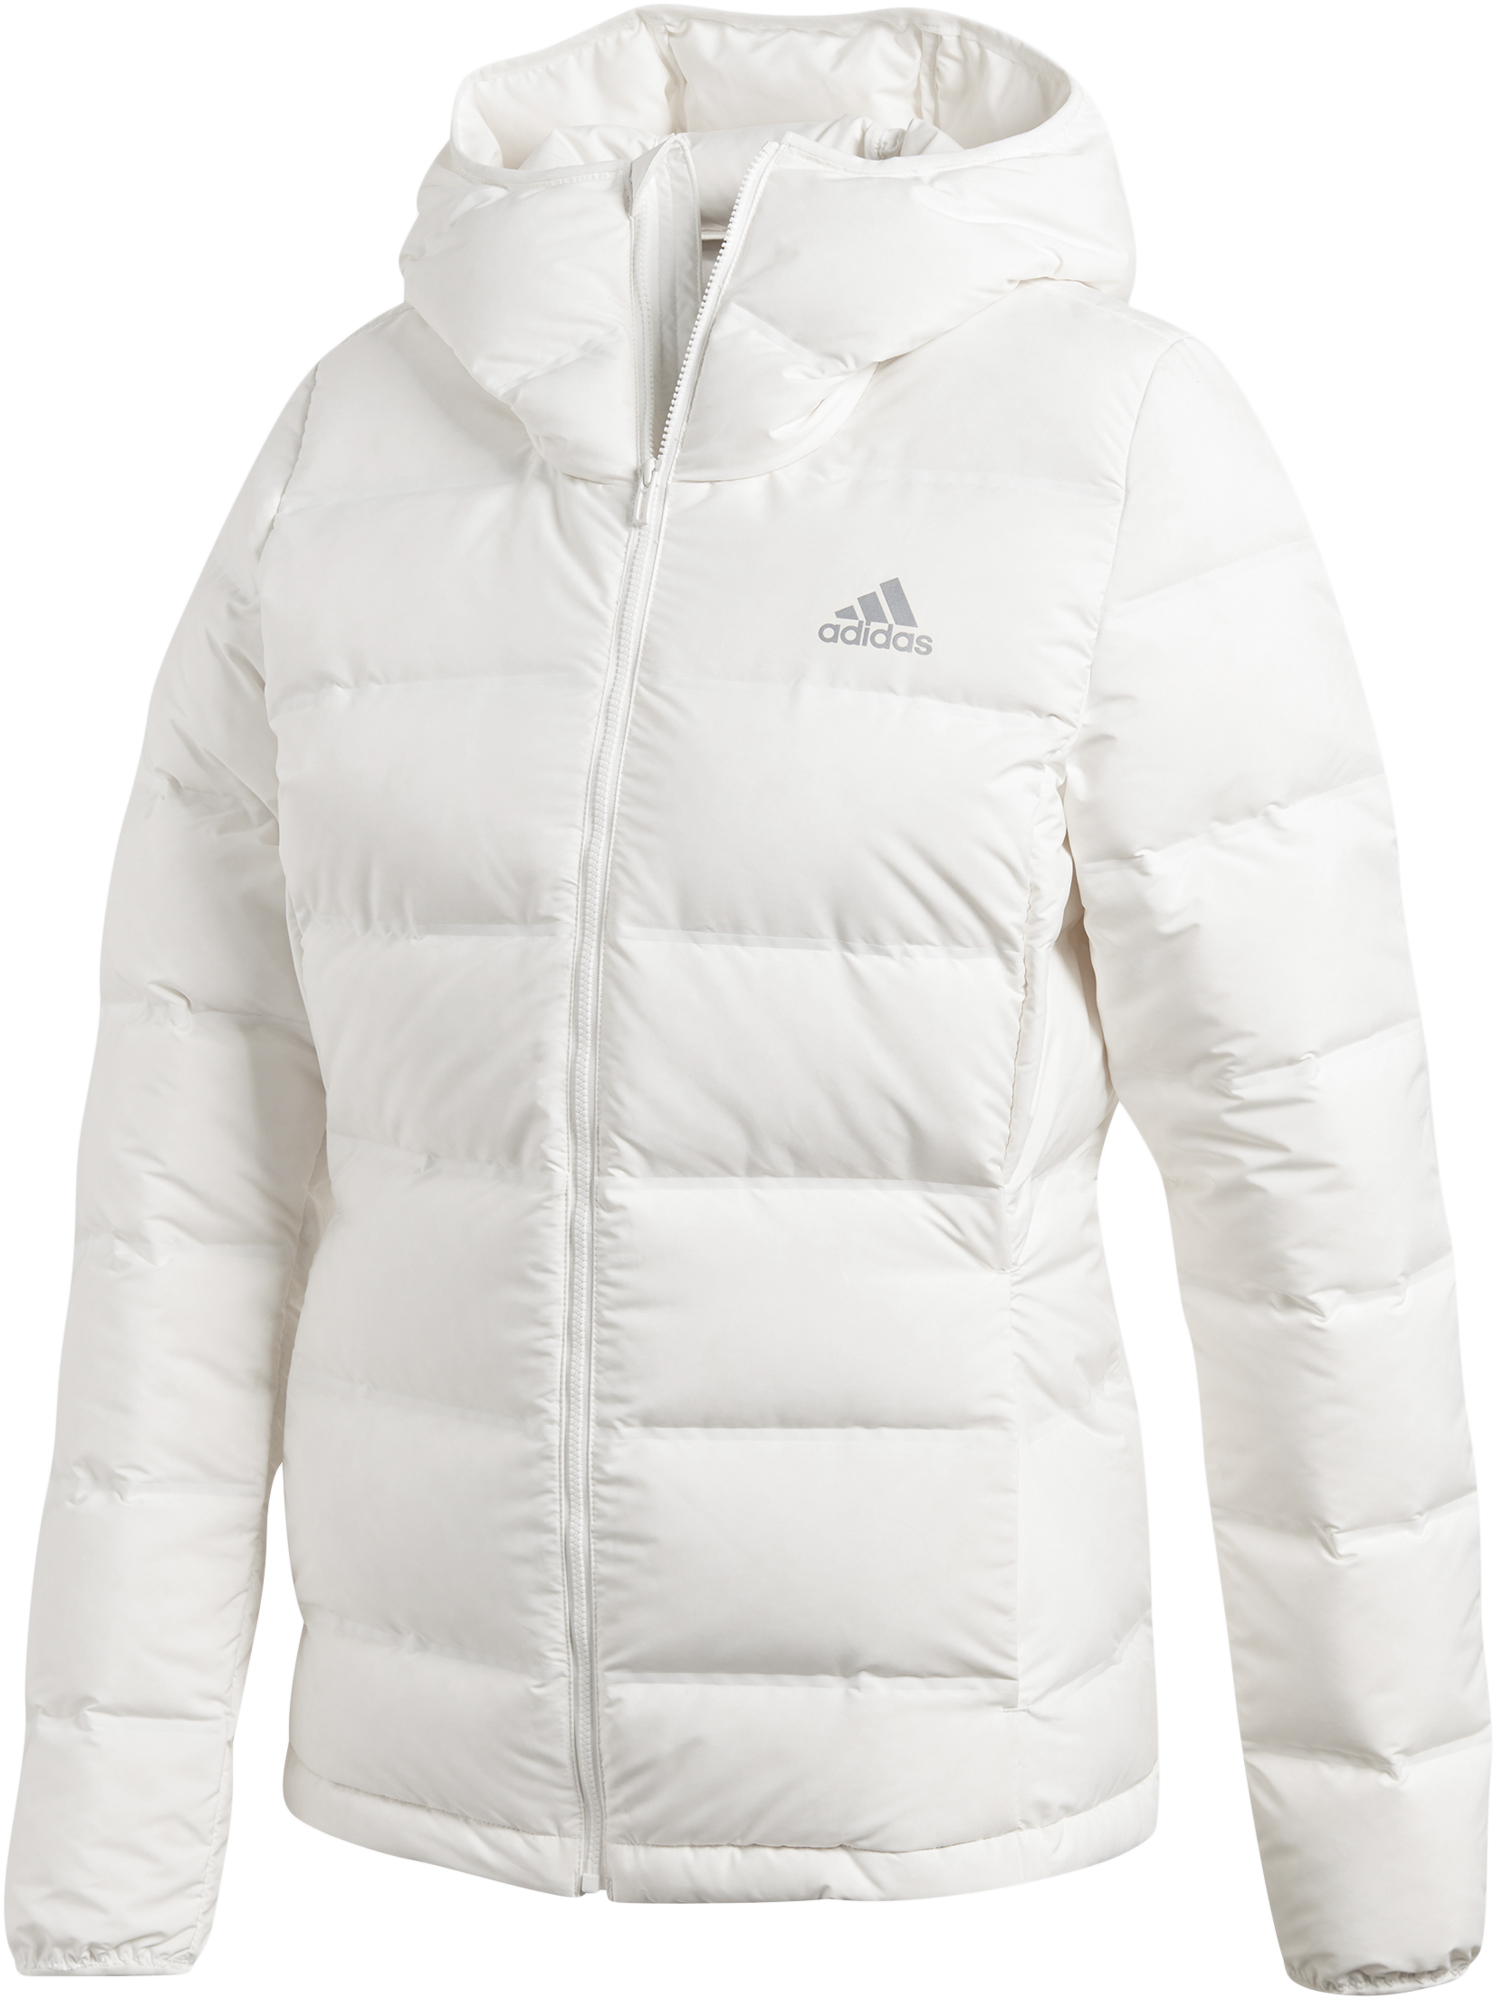 Adidas Куртка пуховая женская Helionic Hooded, размер 48-50